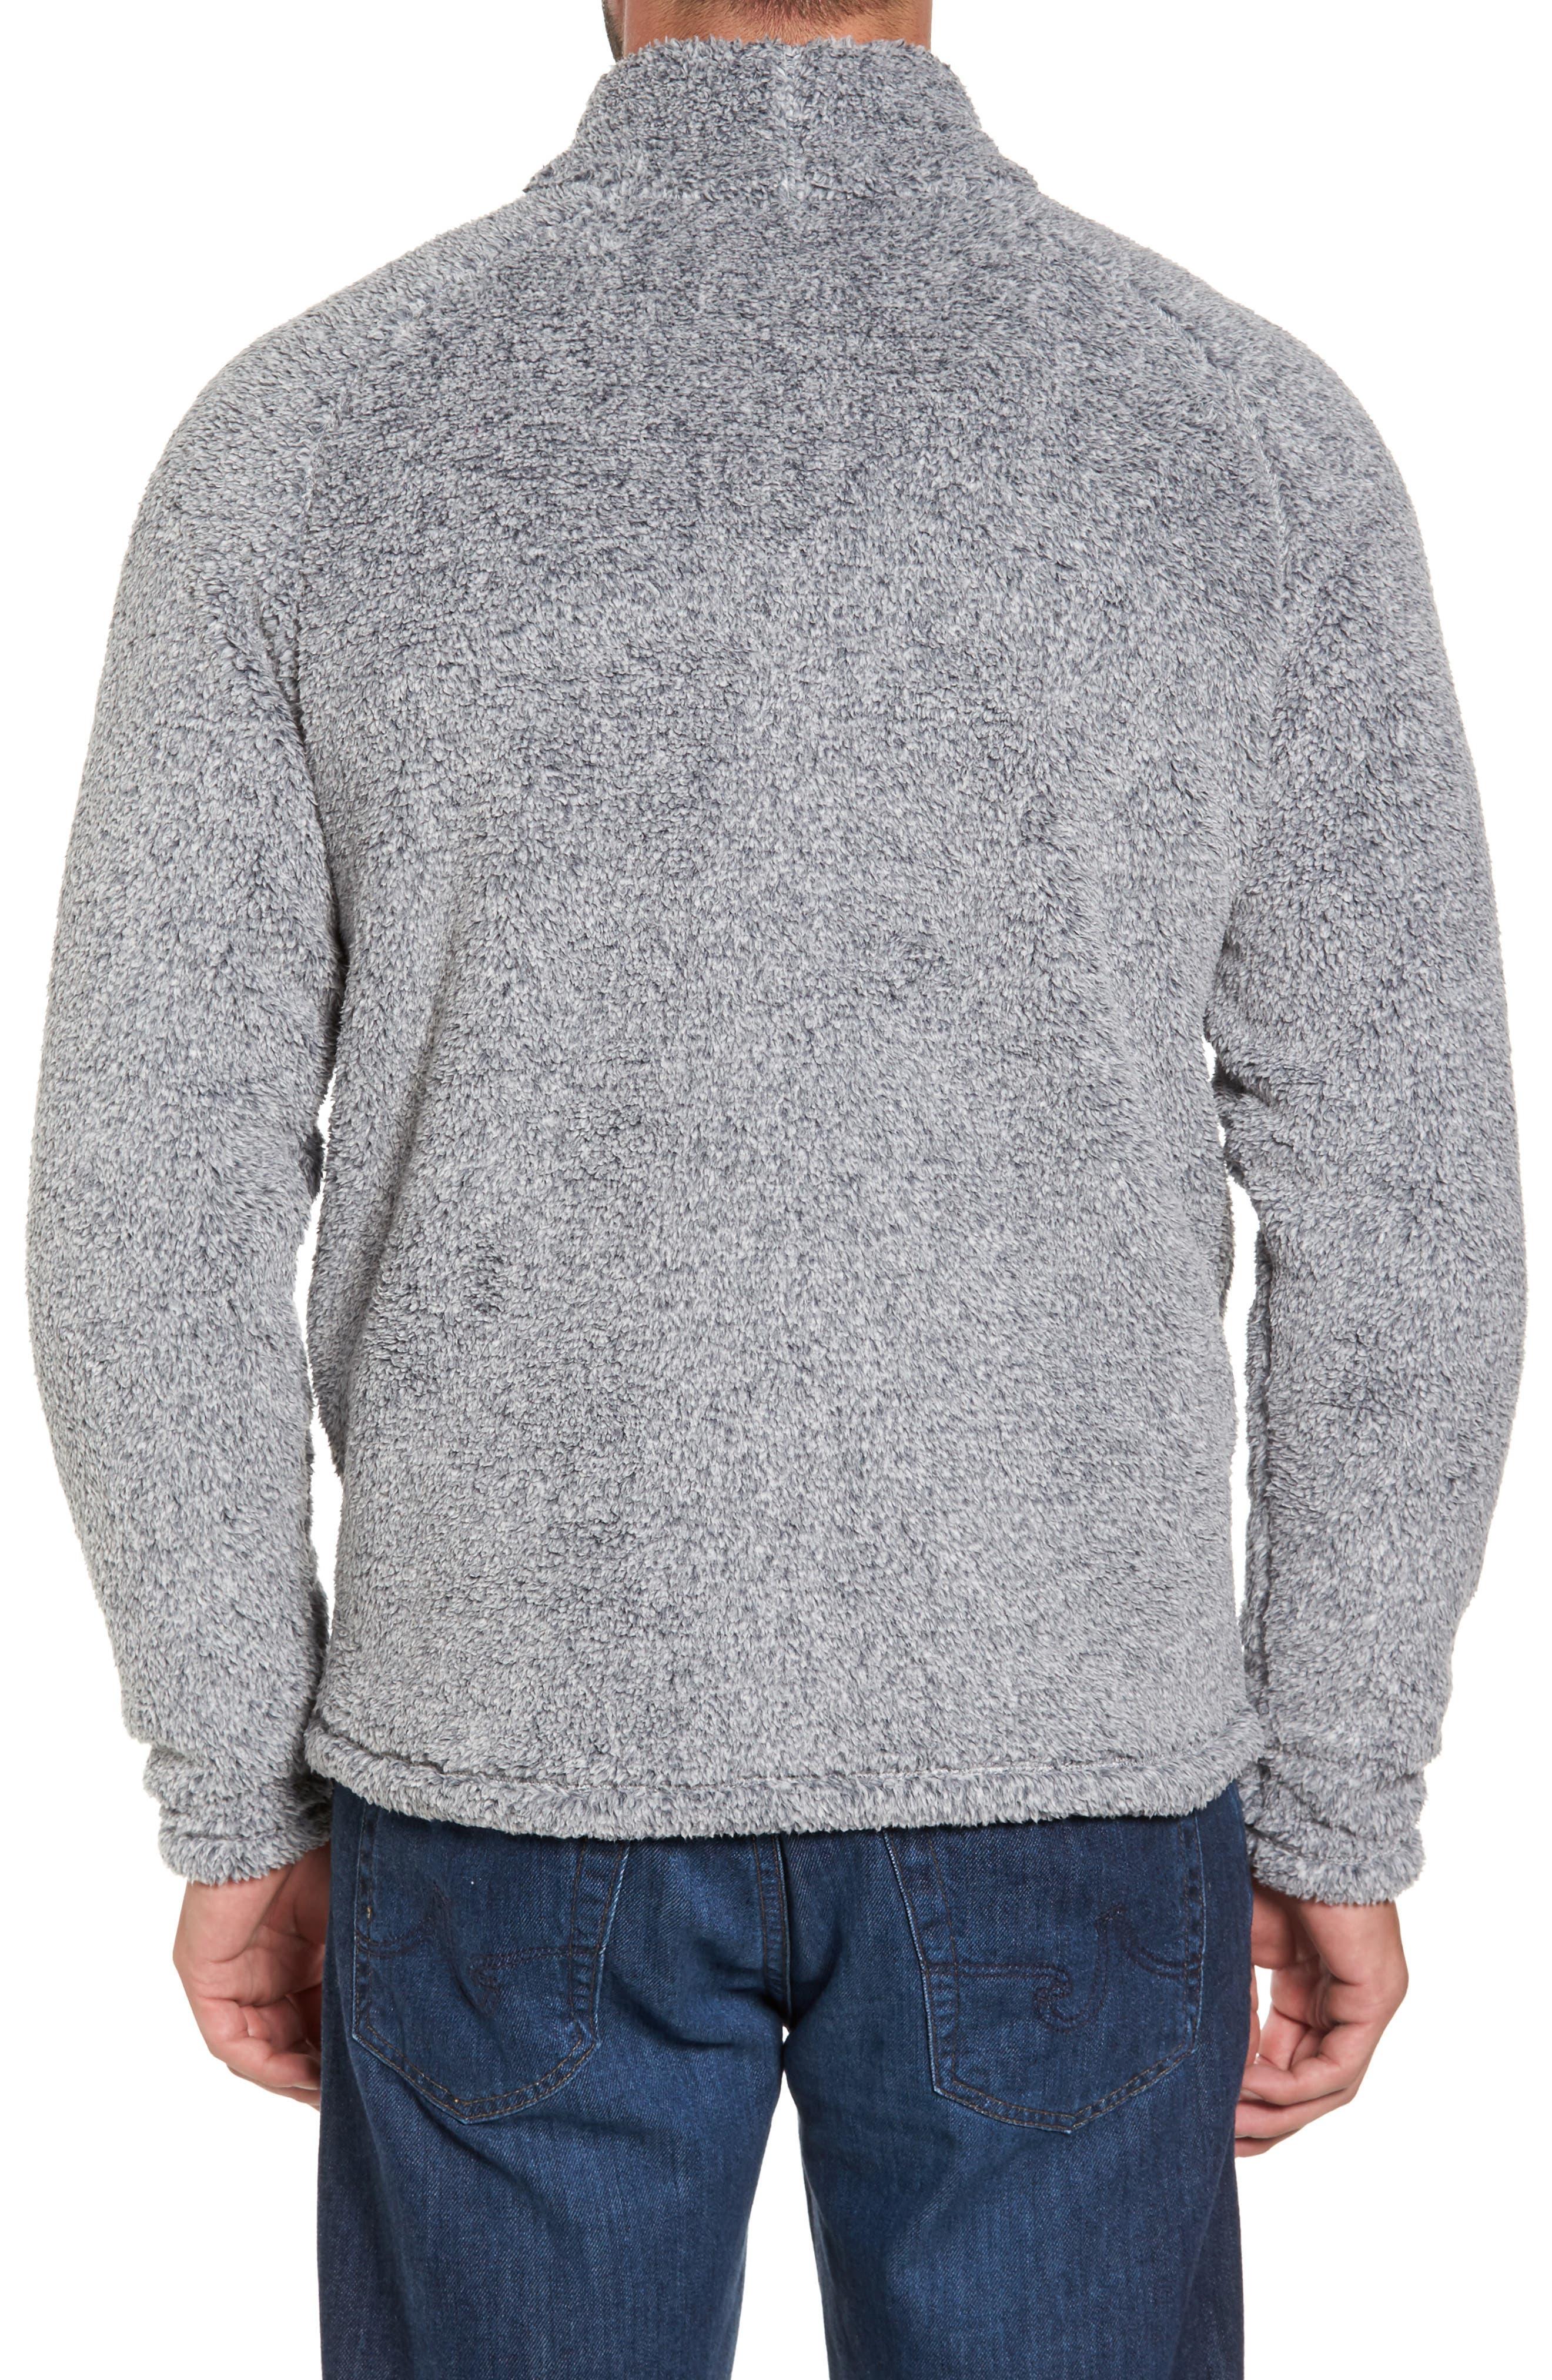 Polar Fleece Quarter Zip Pullover,                             Alternate thumbnail 2, color,                             Black Caviar Heather